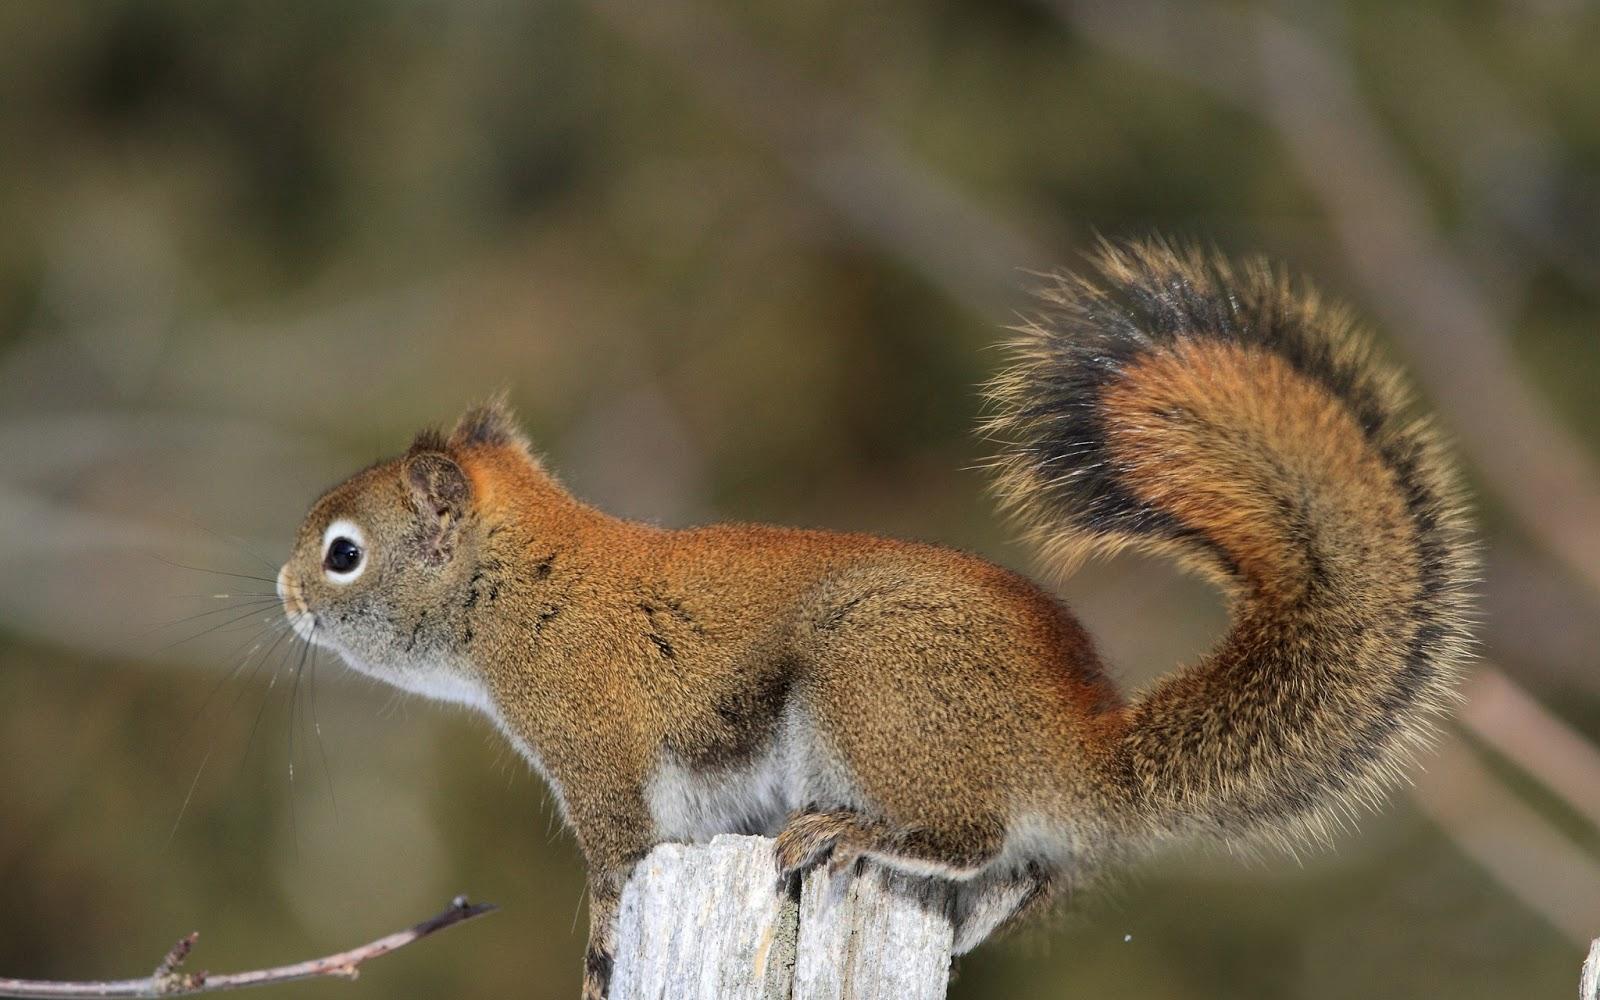 squirrel wallpaper - photo #11